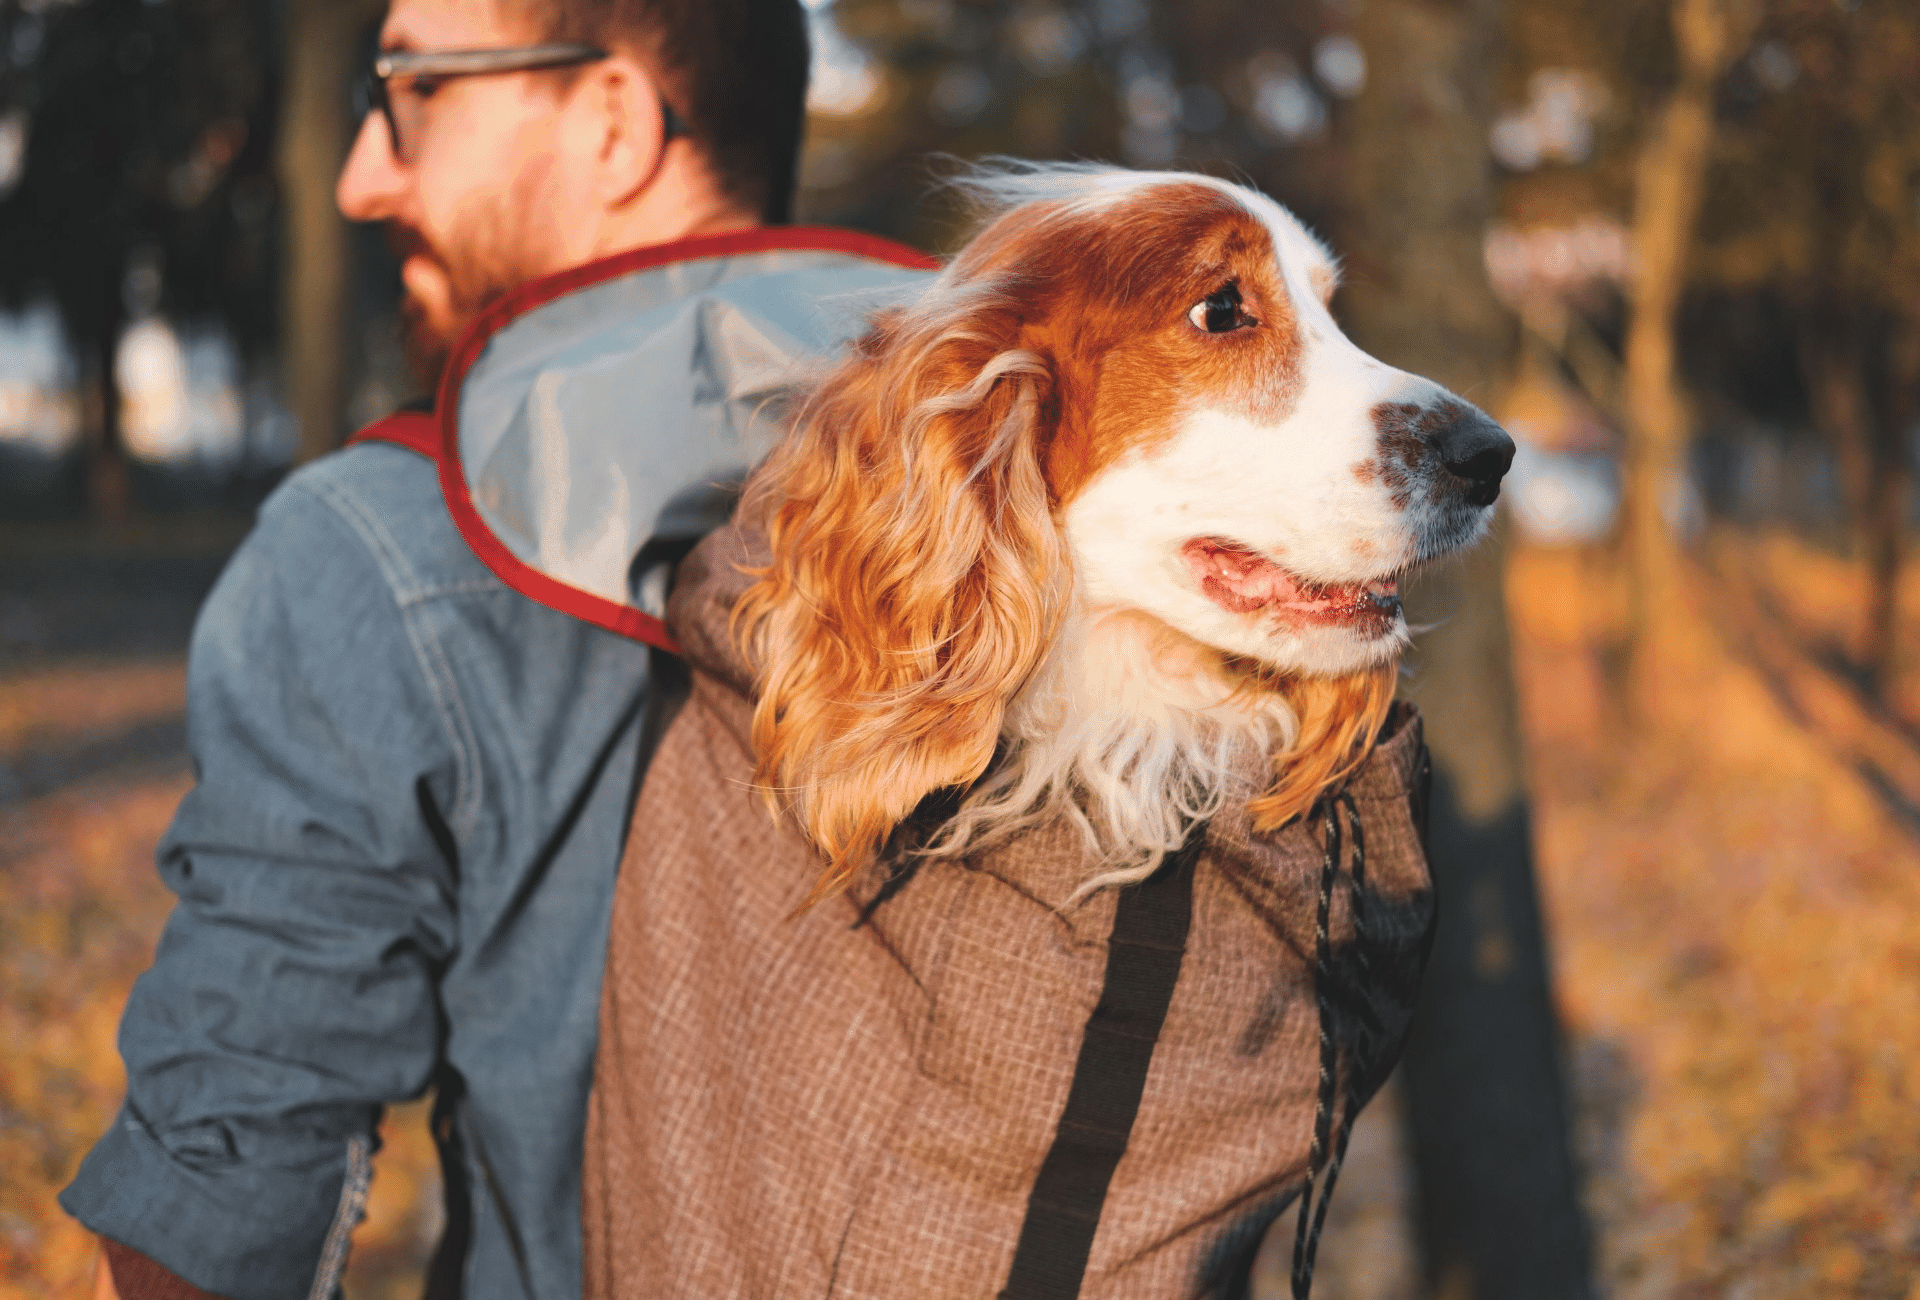 Medium-sized dog in back carrier.